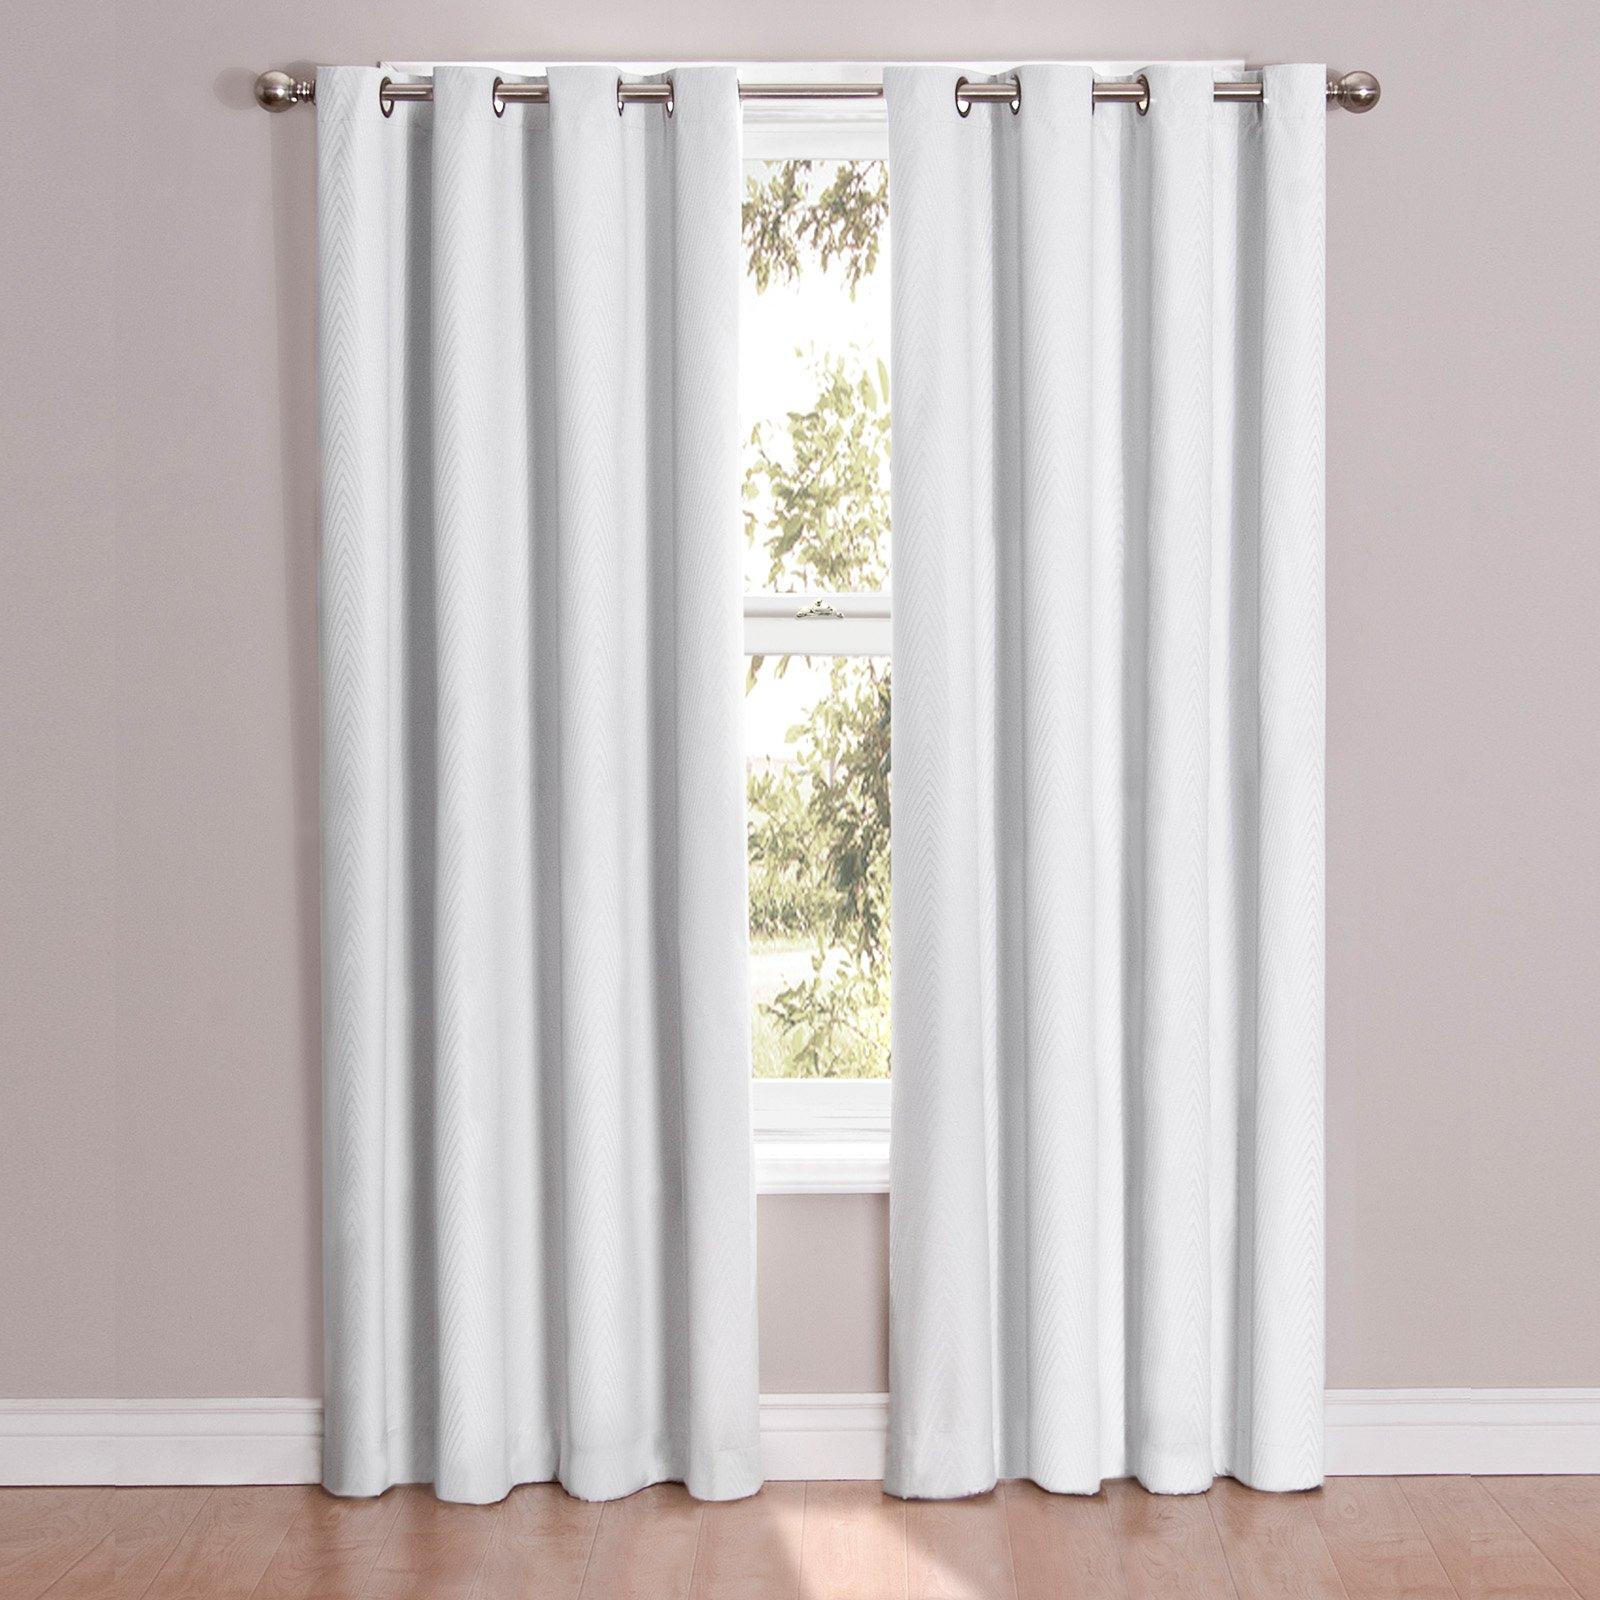 Eclipse Cassidy Blackout Grommet Window Curtain Panel In Blackout Grommet Curtain Panels (View 10 of 20)